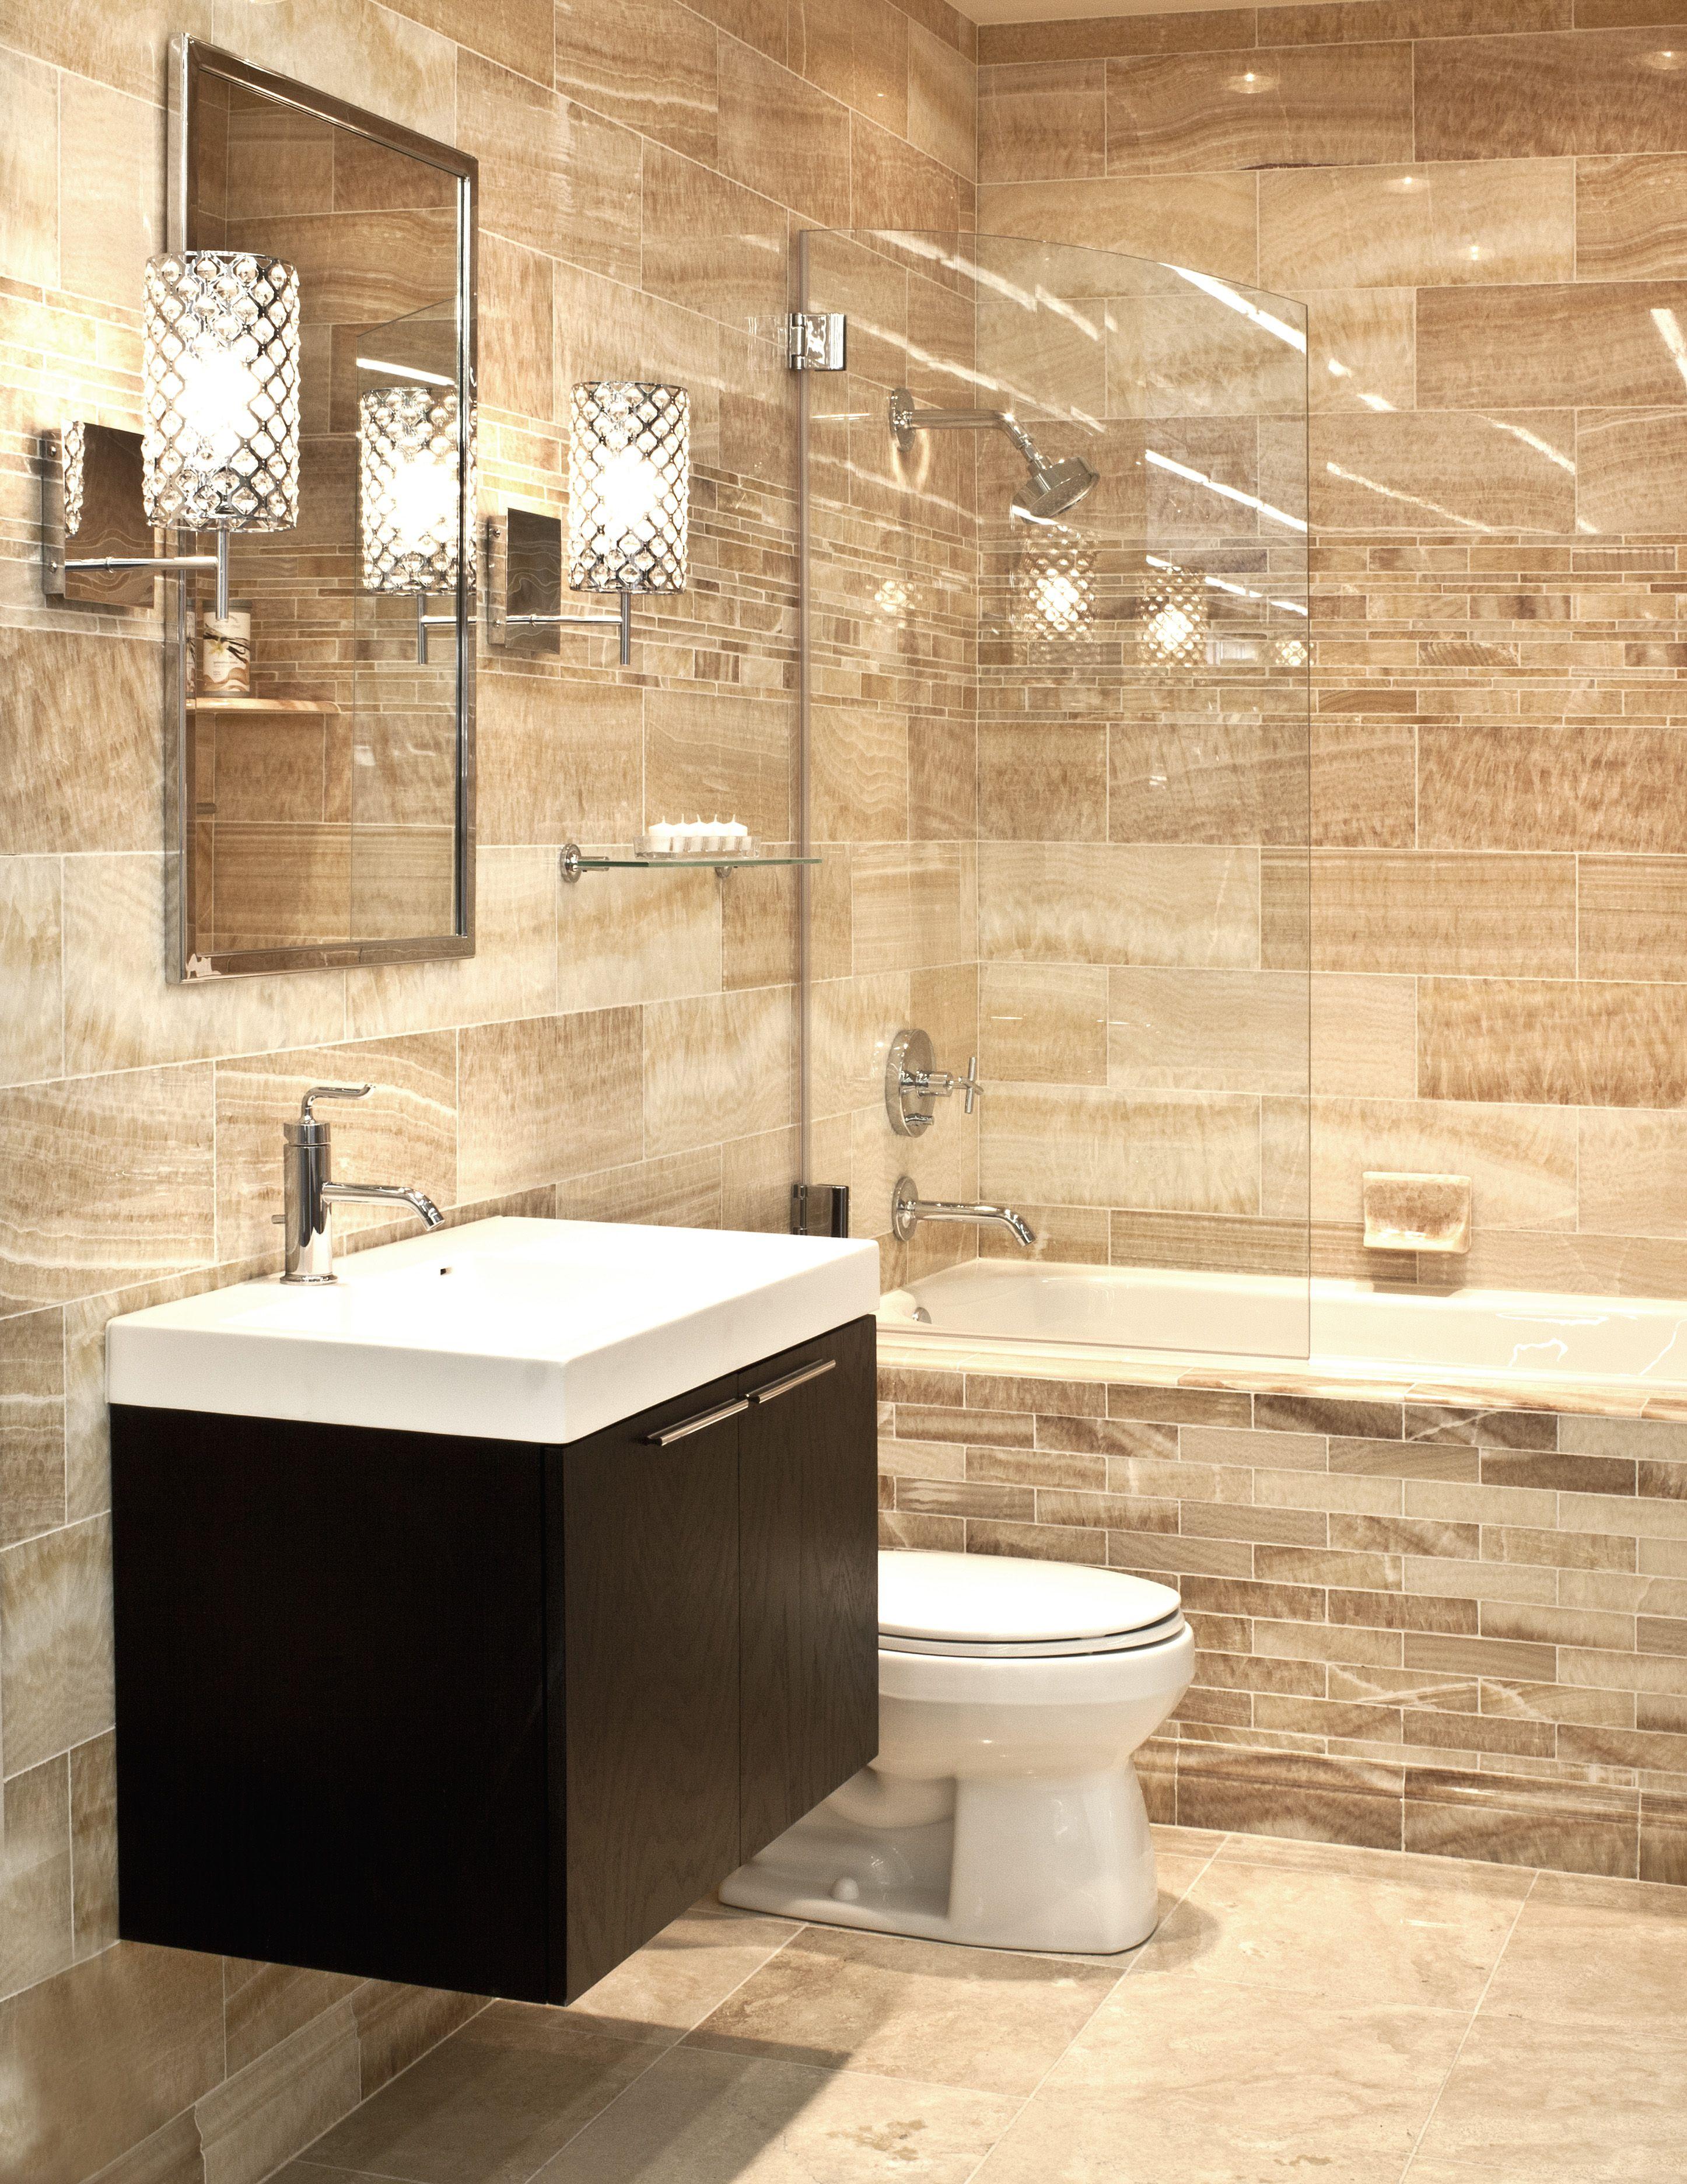 Luxurious Onyx Bathroom  Bathroom  Pinterest